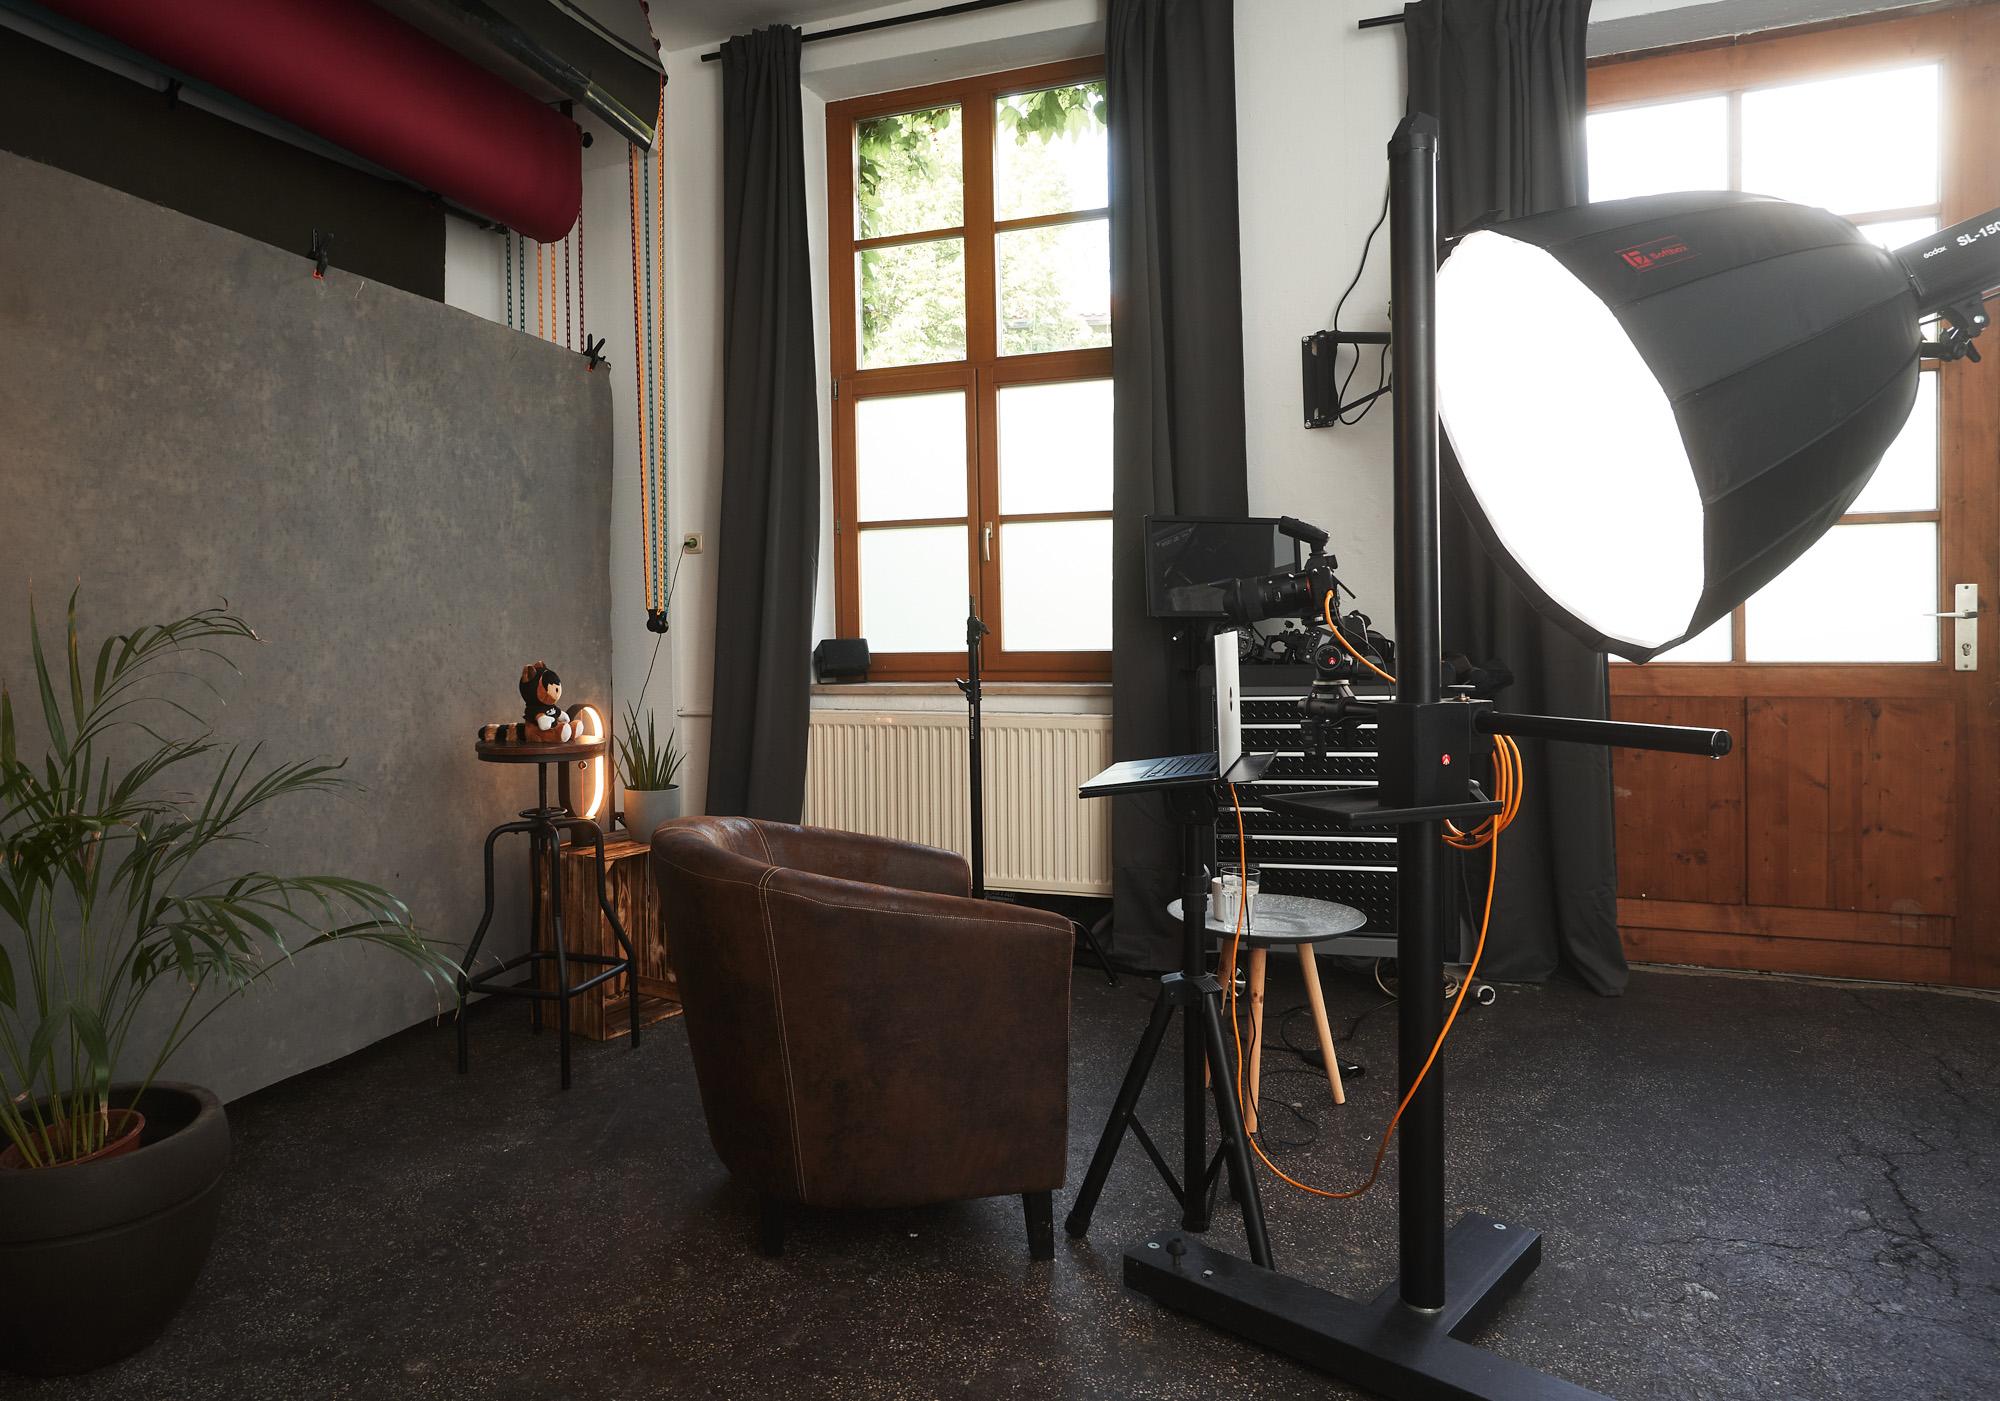 Fotostudio in München mieten ©Offenblende